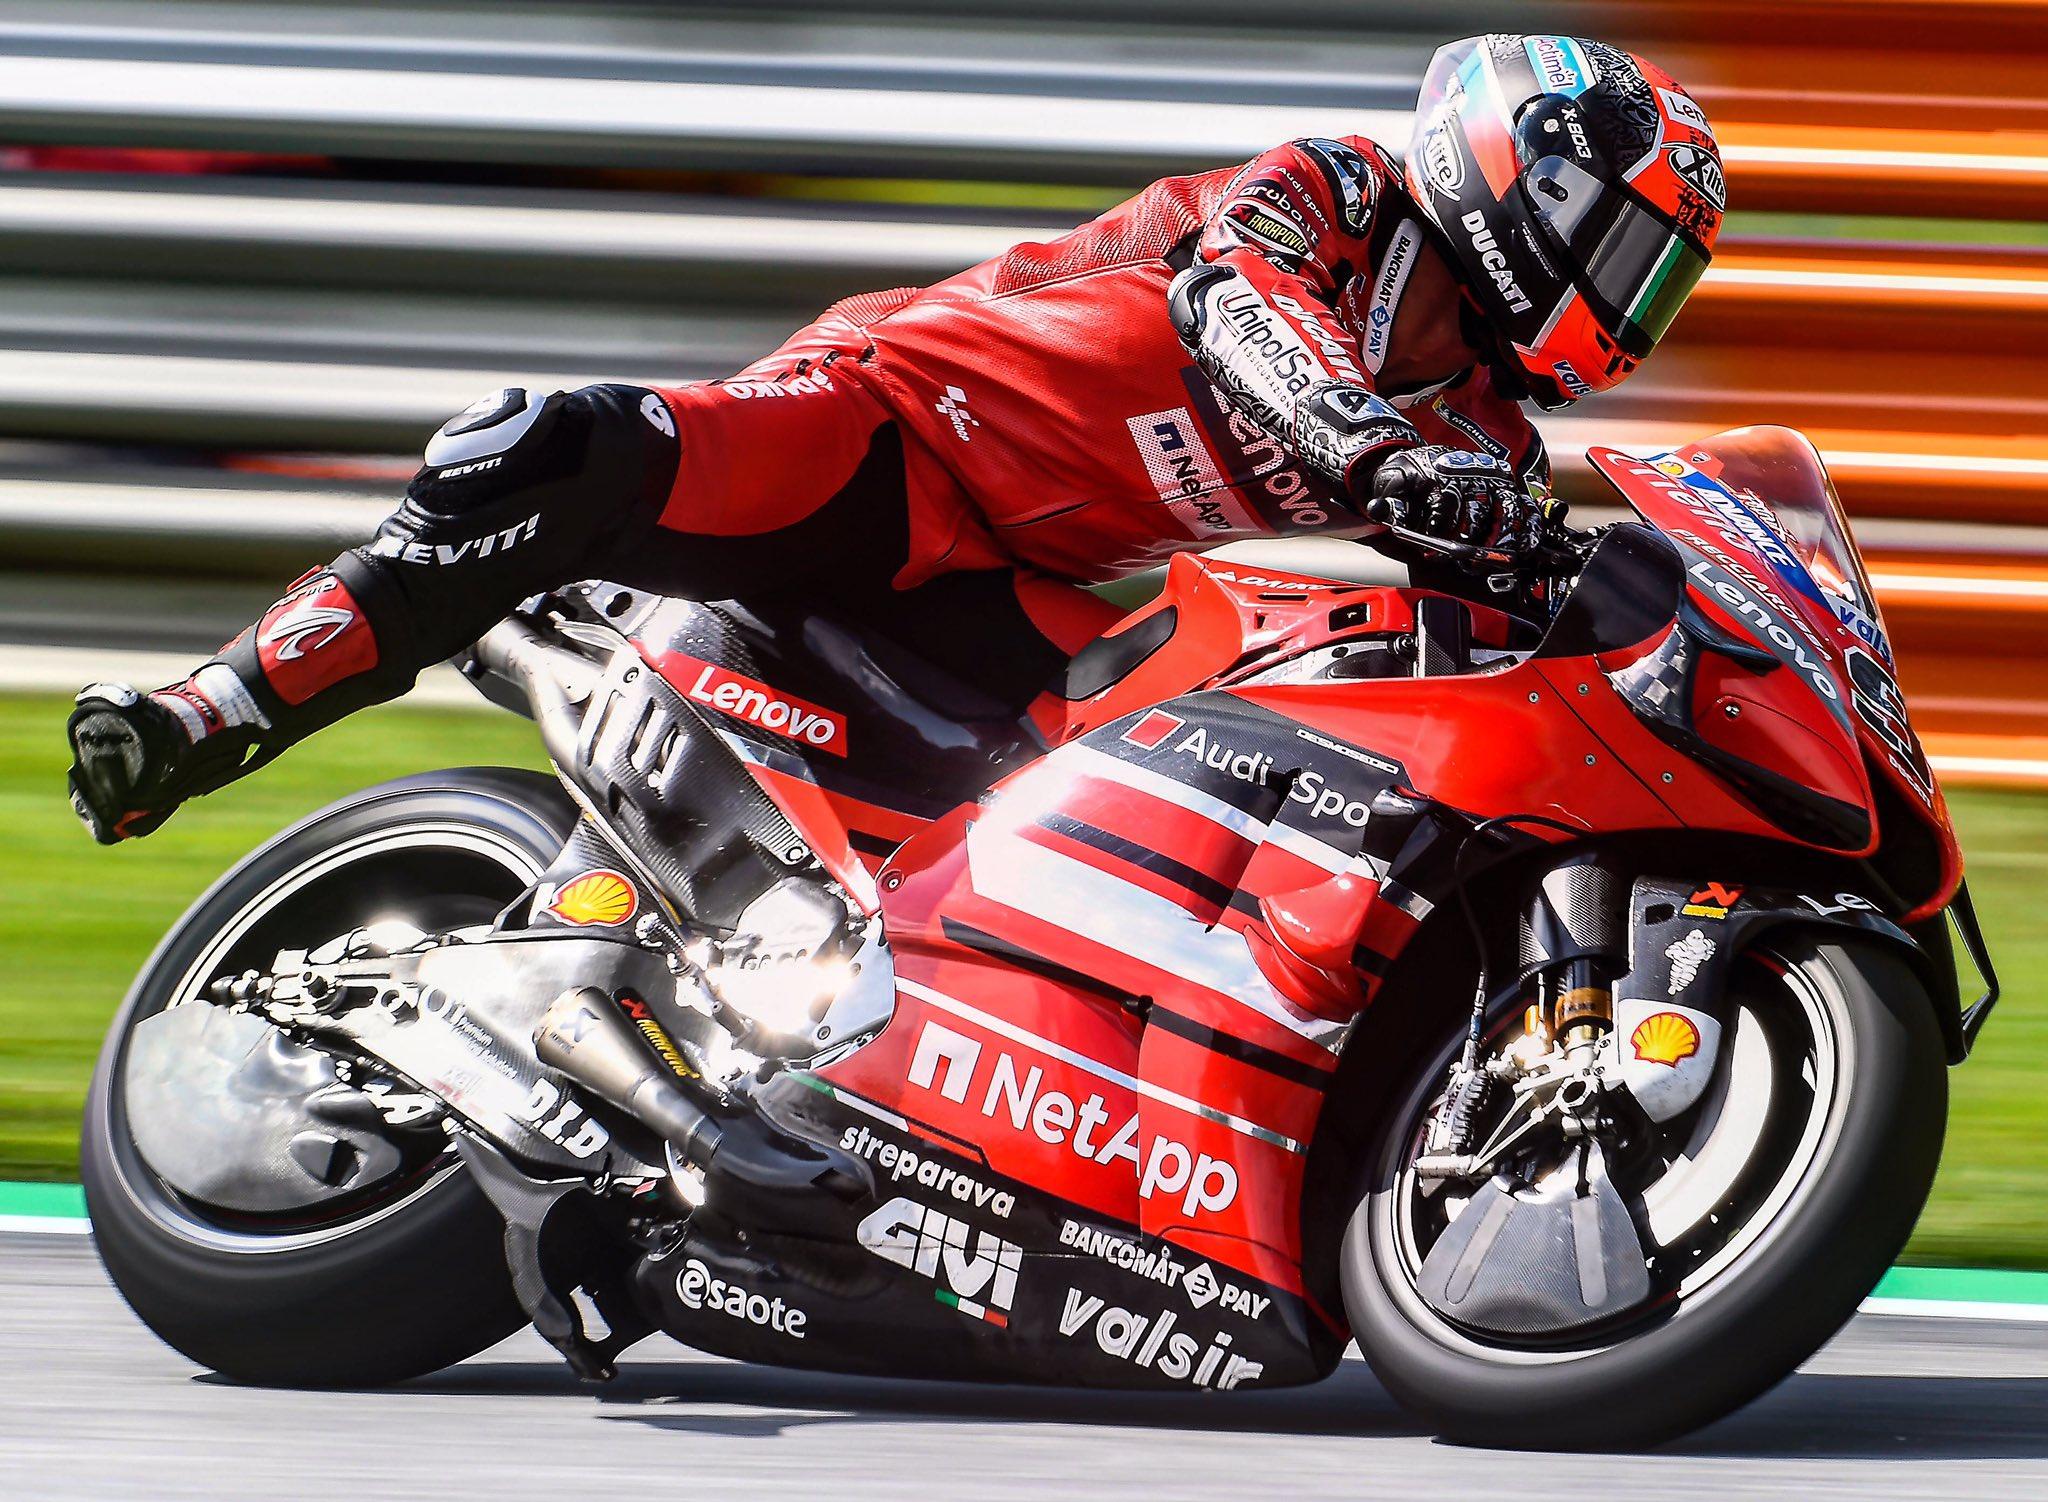 MotoGP Moto2 Moto3 2020 - Page 24 Efe4to10